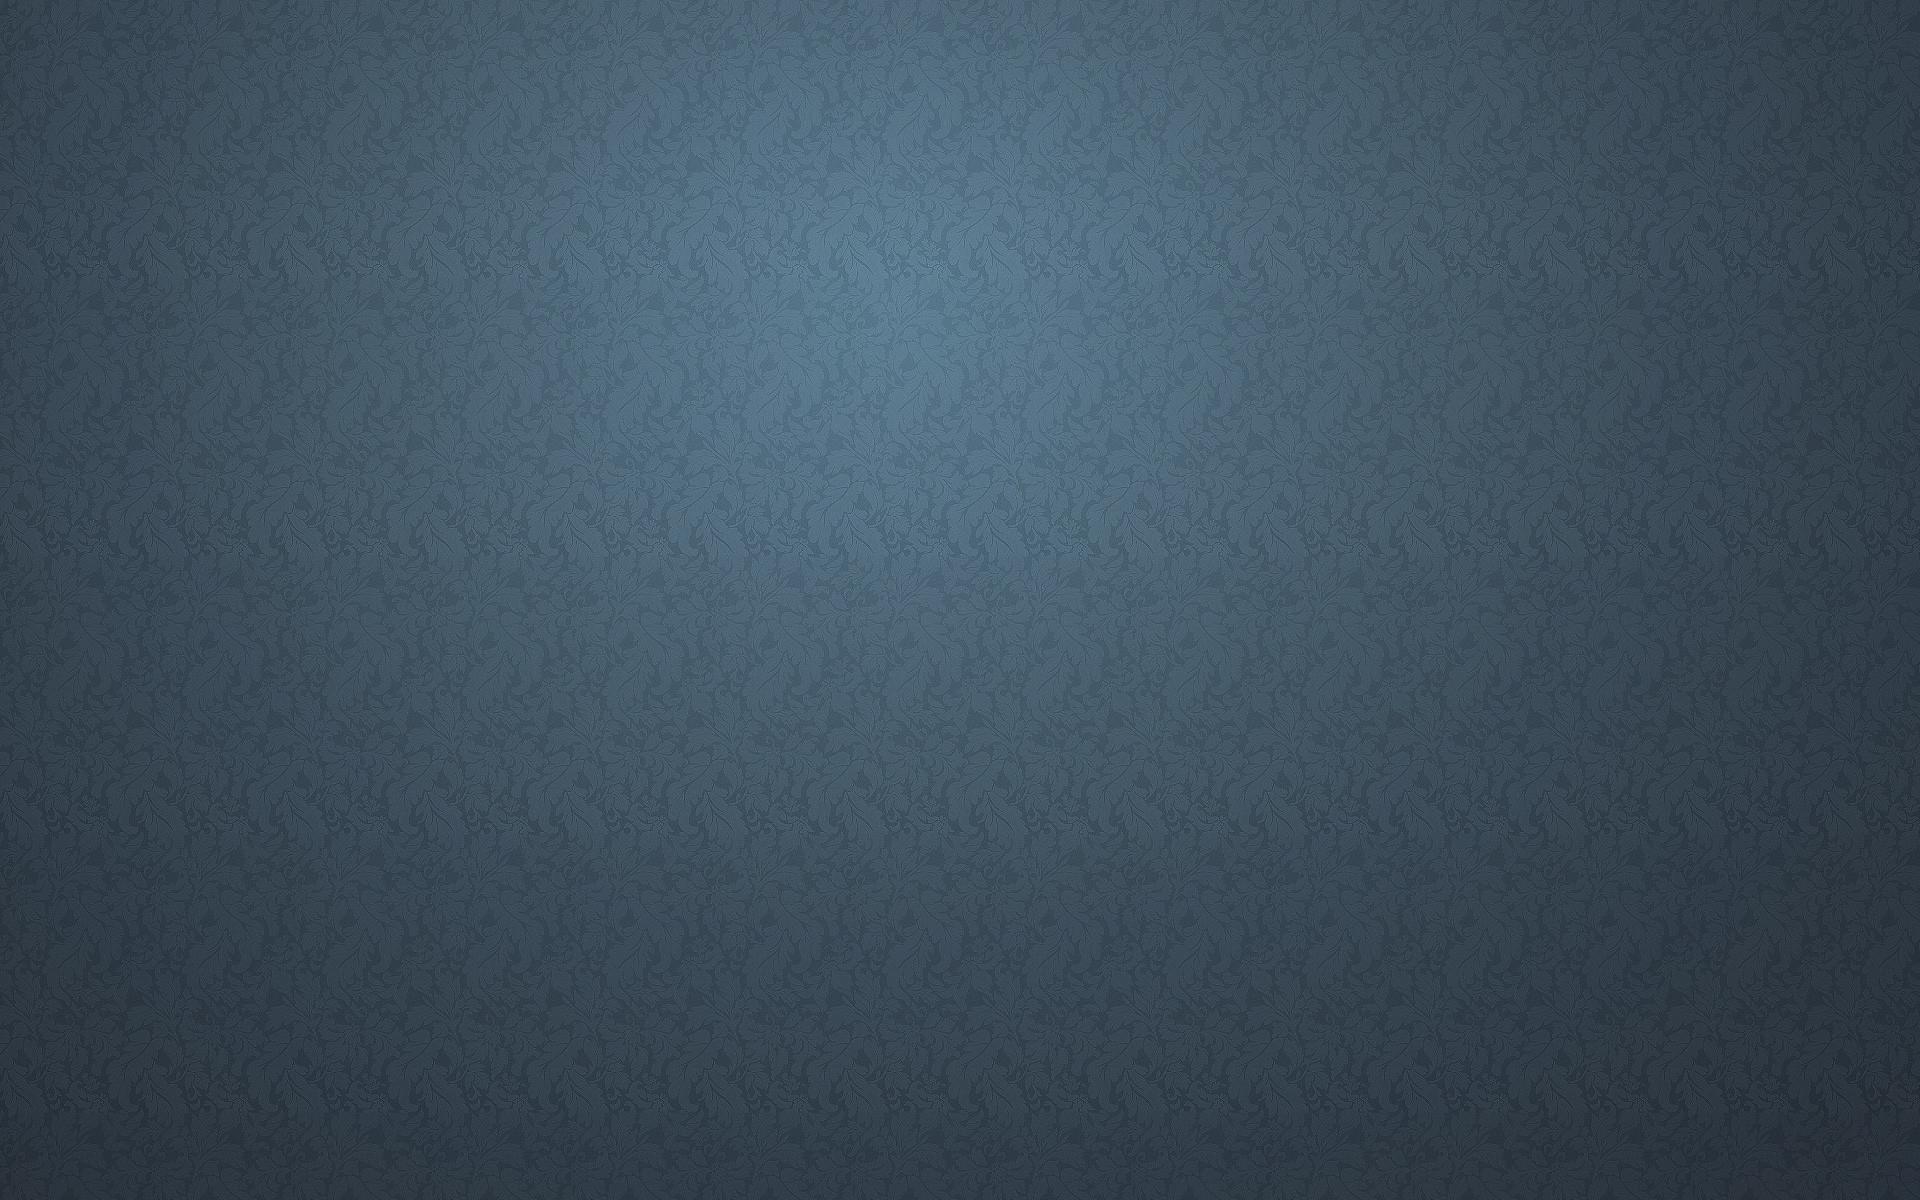 0 Grey Wallpaper Grey Wallpapers For Desktop Pixels Talk